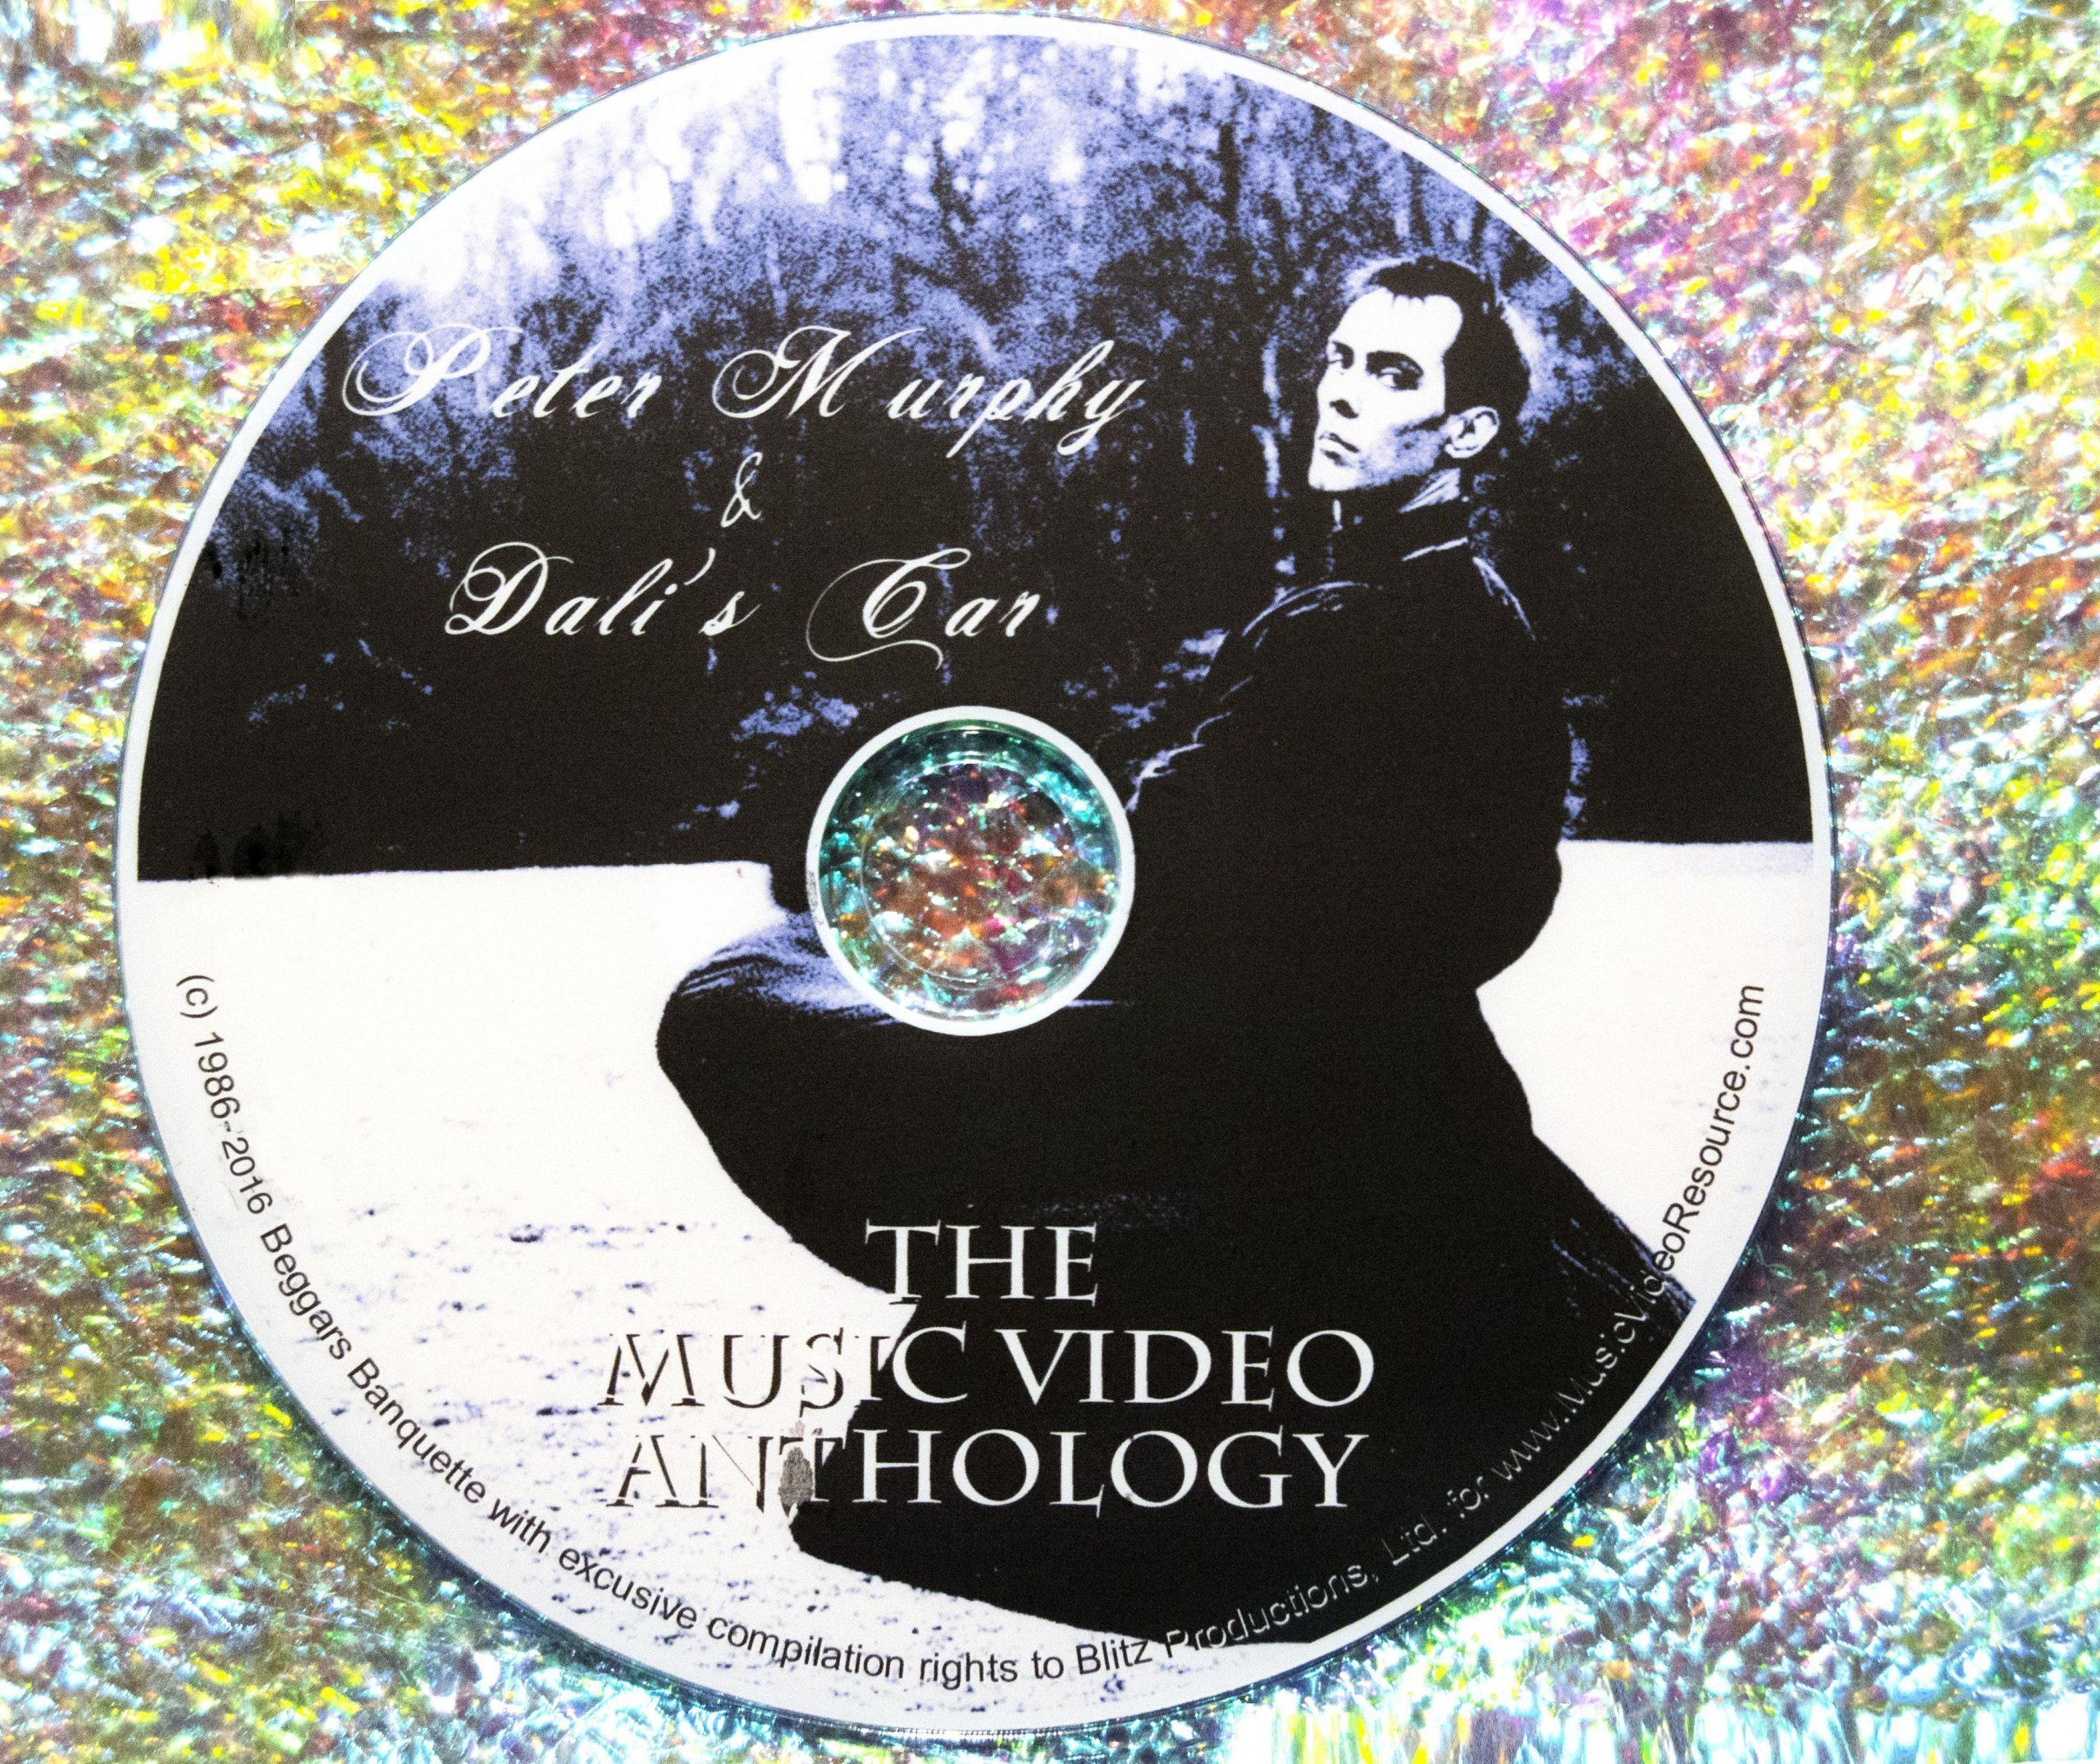 Peter Murphy & Dali's Car The Music Video Collection 1984-2014 (Bauhaus Love and Rockets Mick Karn)